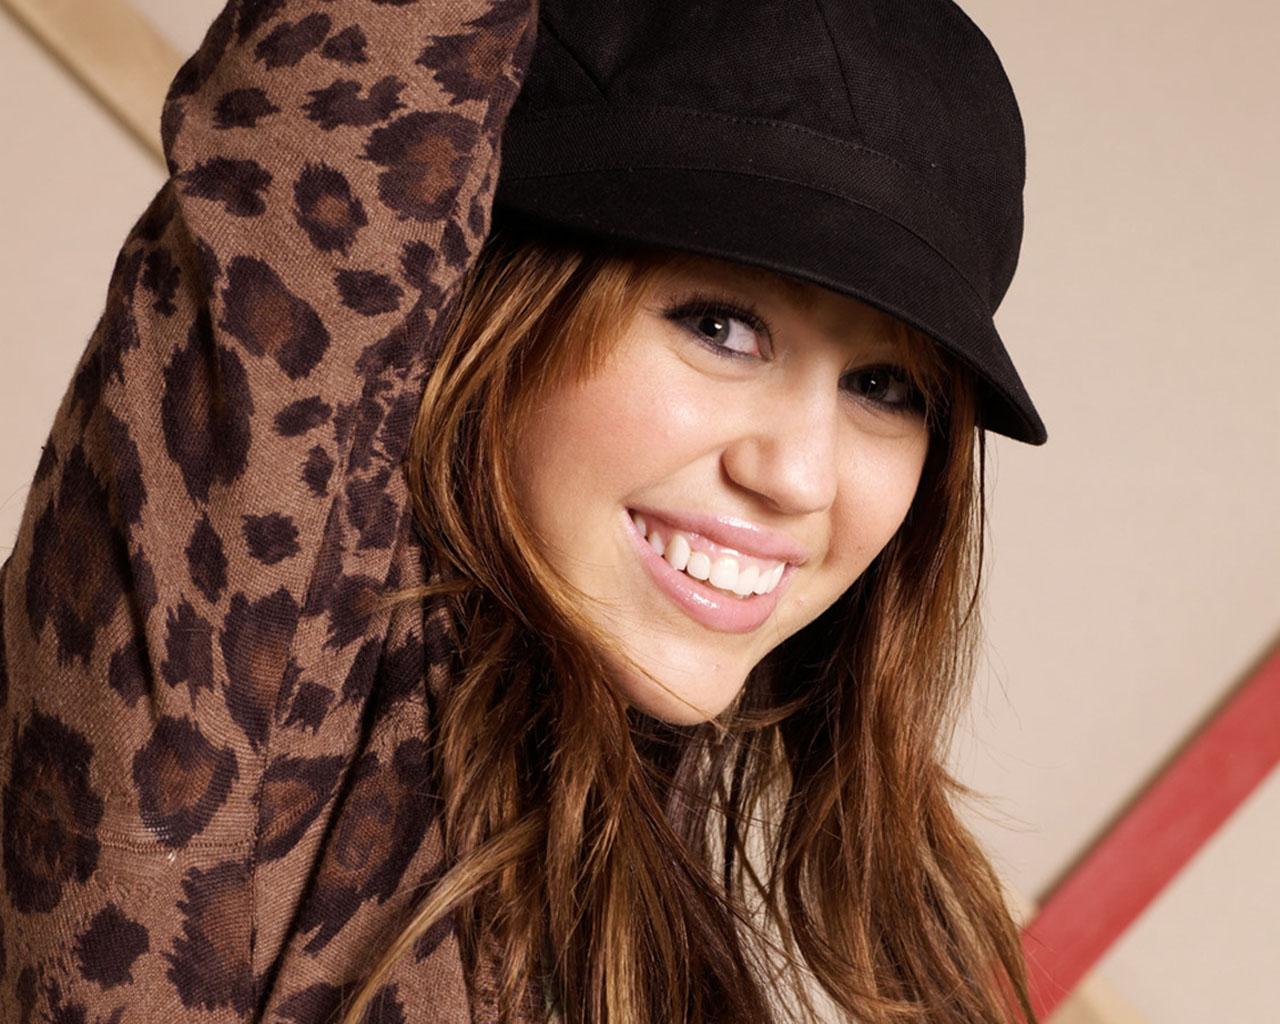 http://4.bp.blogspot.com/-JpMHYrZxOYk/T2Iq7D4fLTI/AAAAAAAAAL0/yUTCaNCbFGk/s1600/Miley%2BCyrus%2B4.jpg